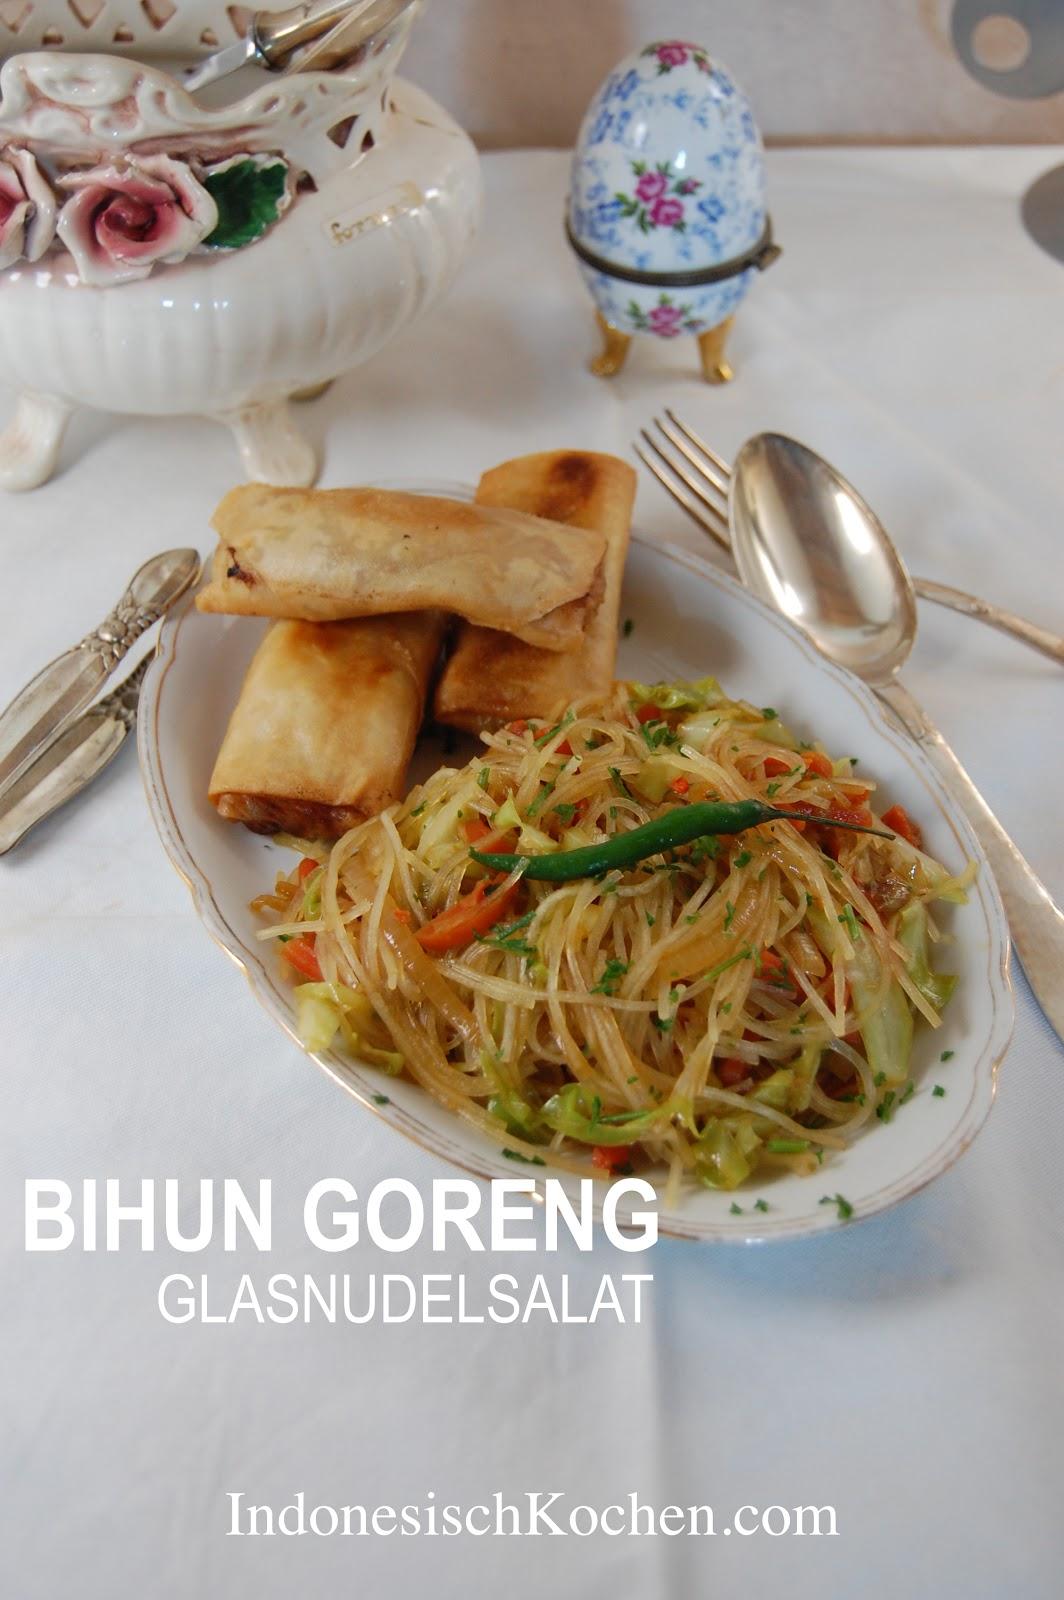 Rezept Bihun Goreng, Glasnudelsalat auf Javanischer Art